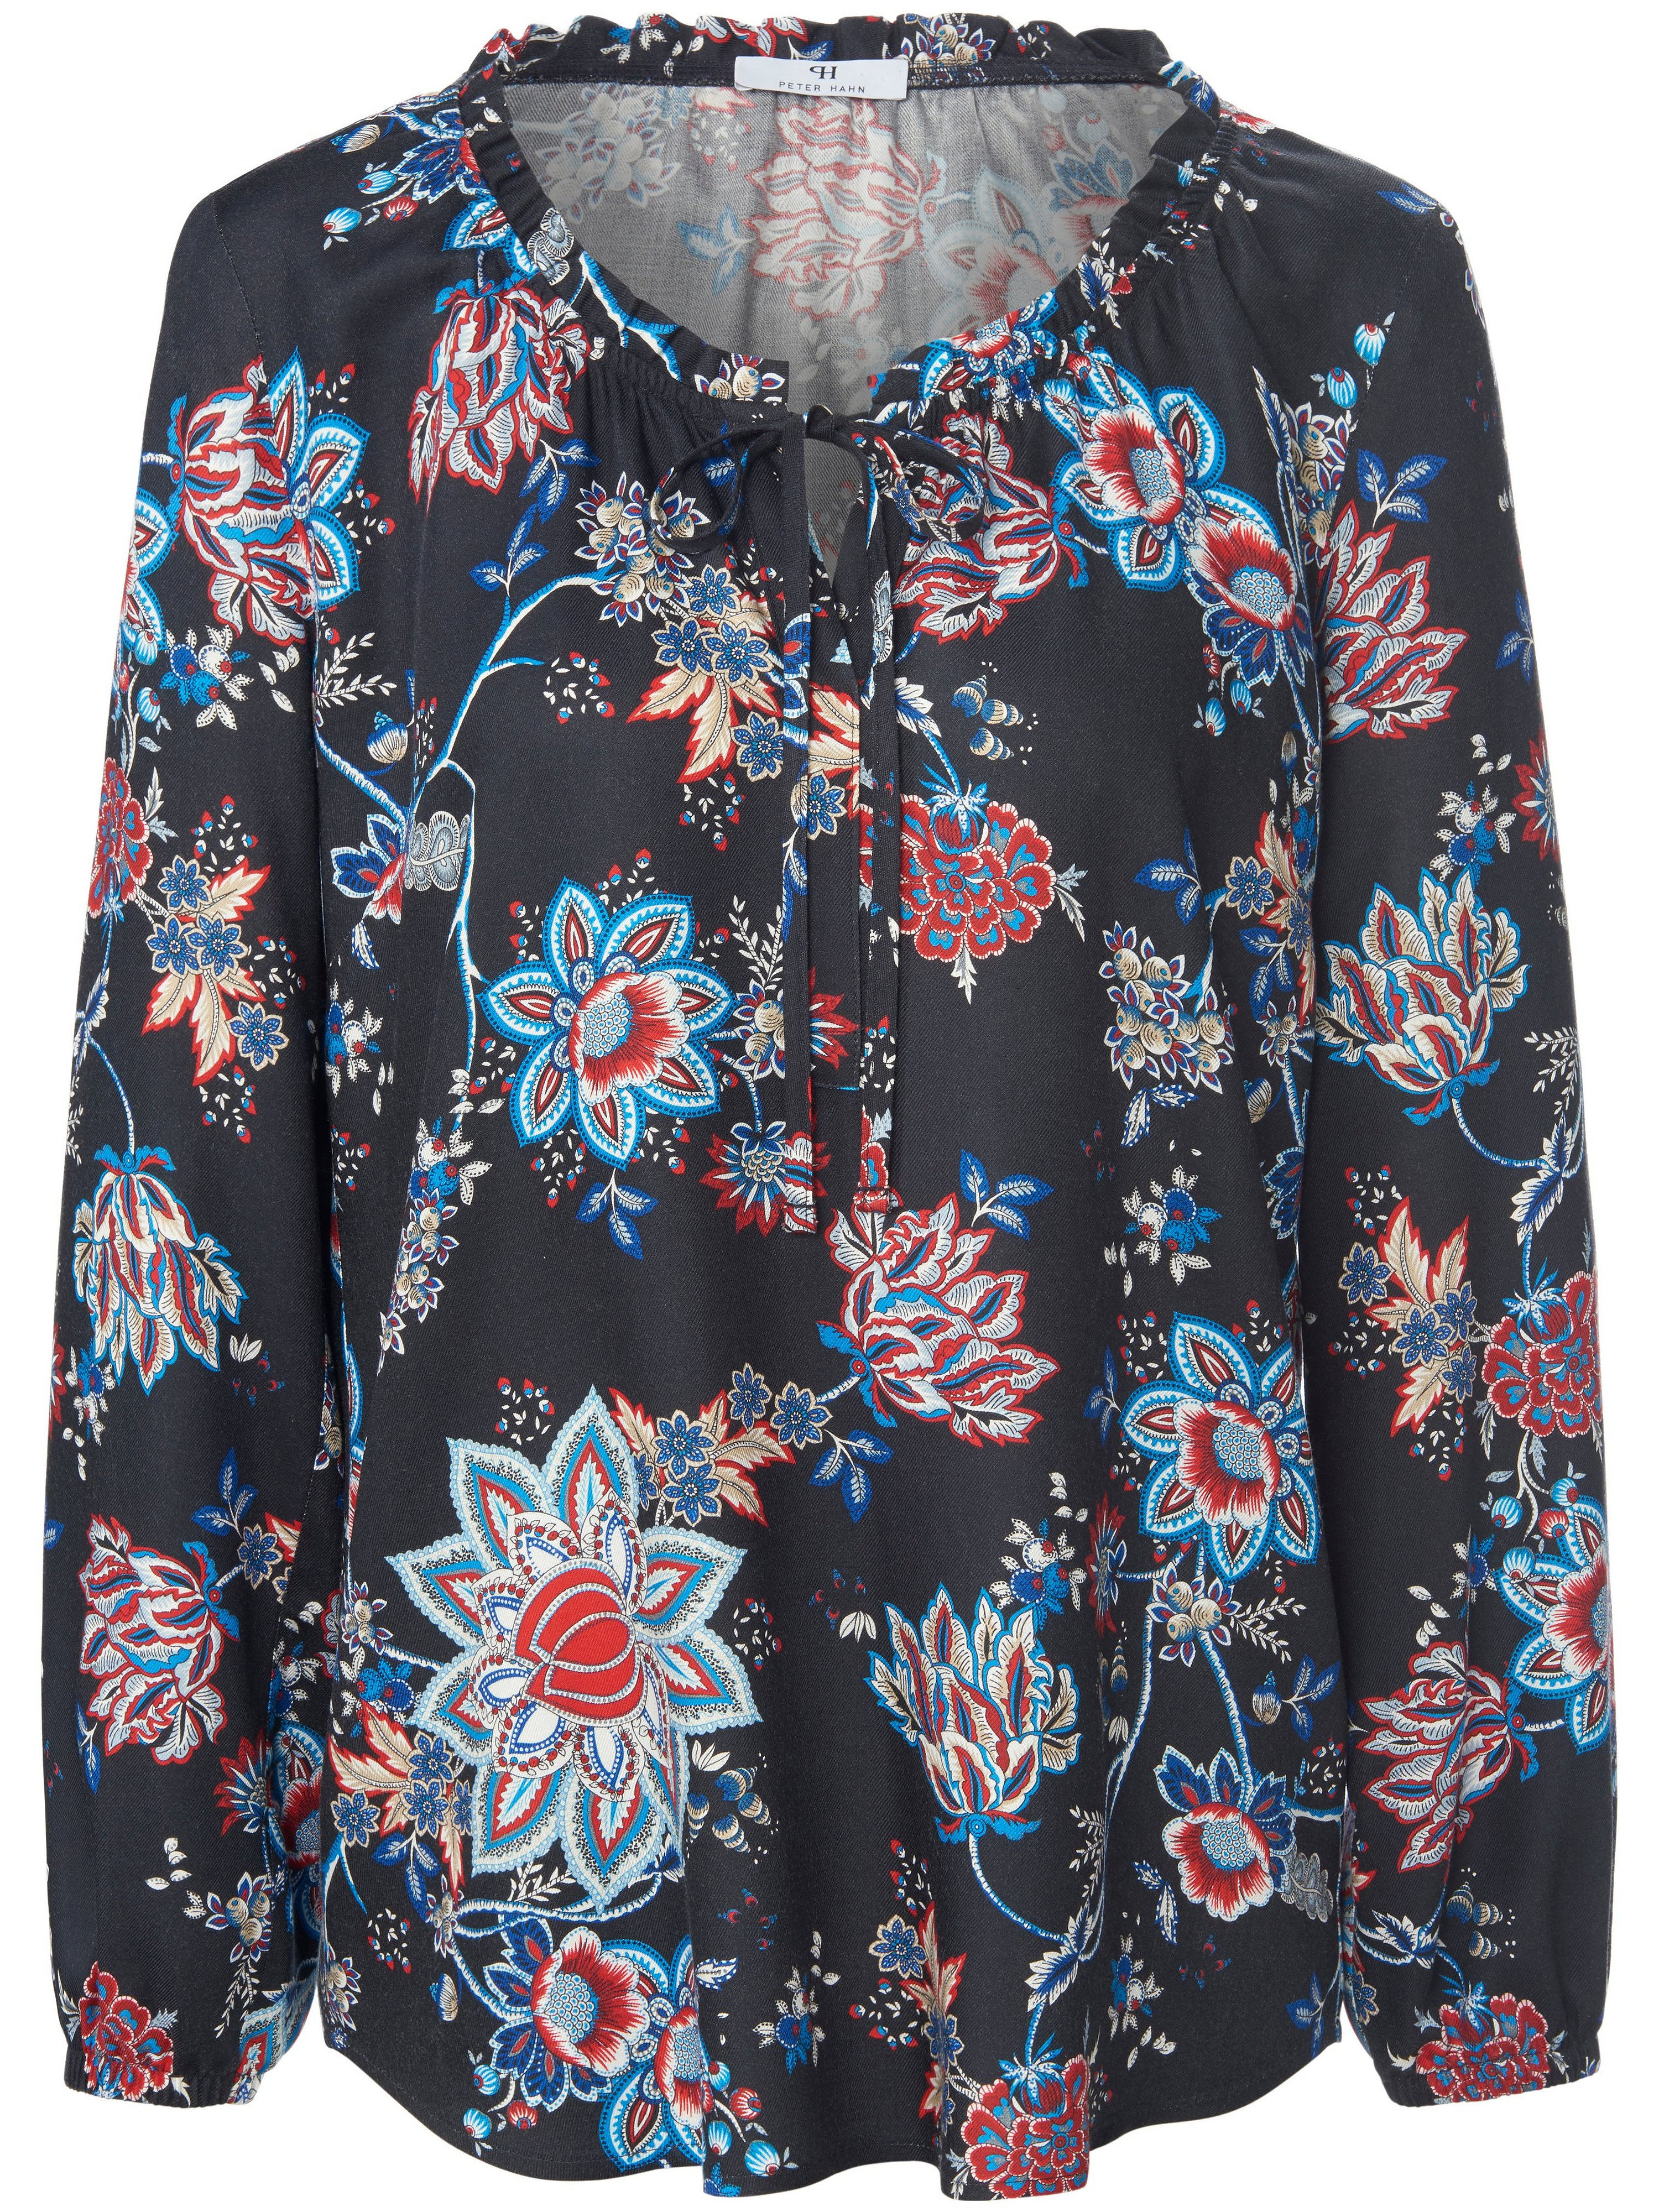 Lange blouse 100% viscose Van Peter Hahn blauw